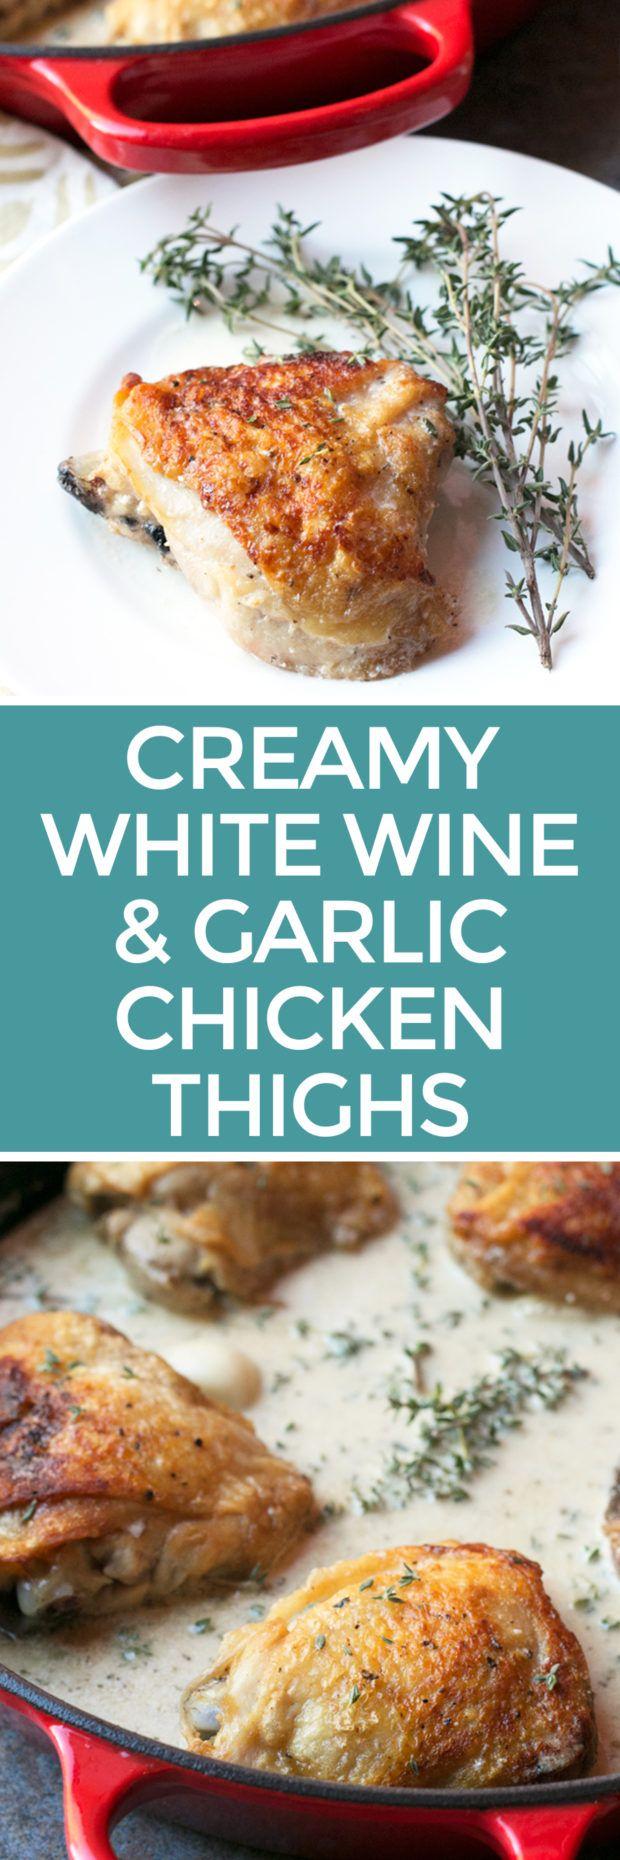 Creamy White Wine & Garlic Roasted Chicken Thighs – Cake 'n Knife